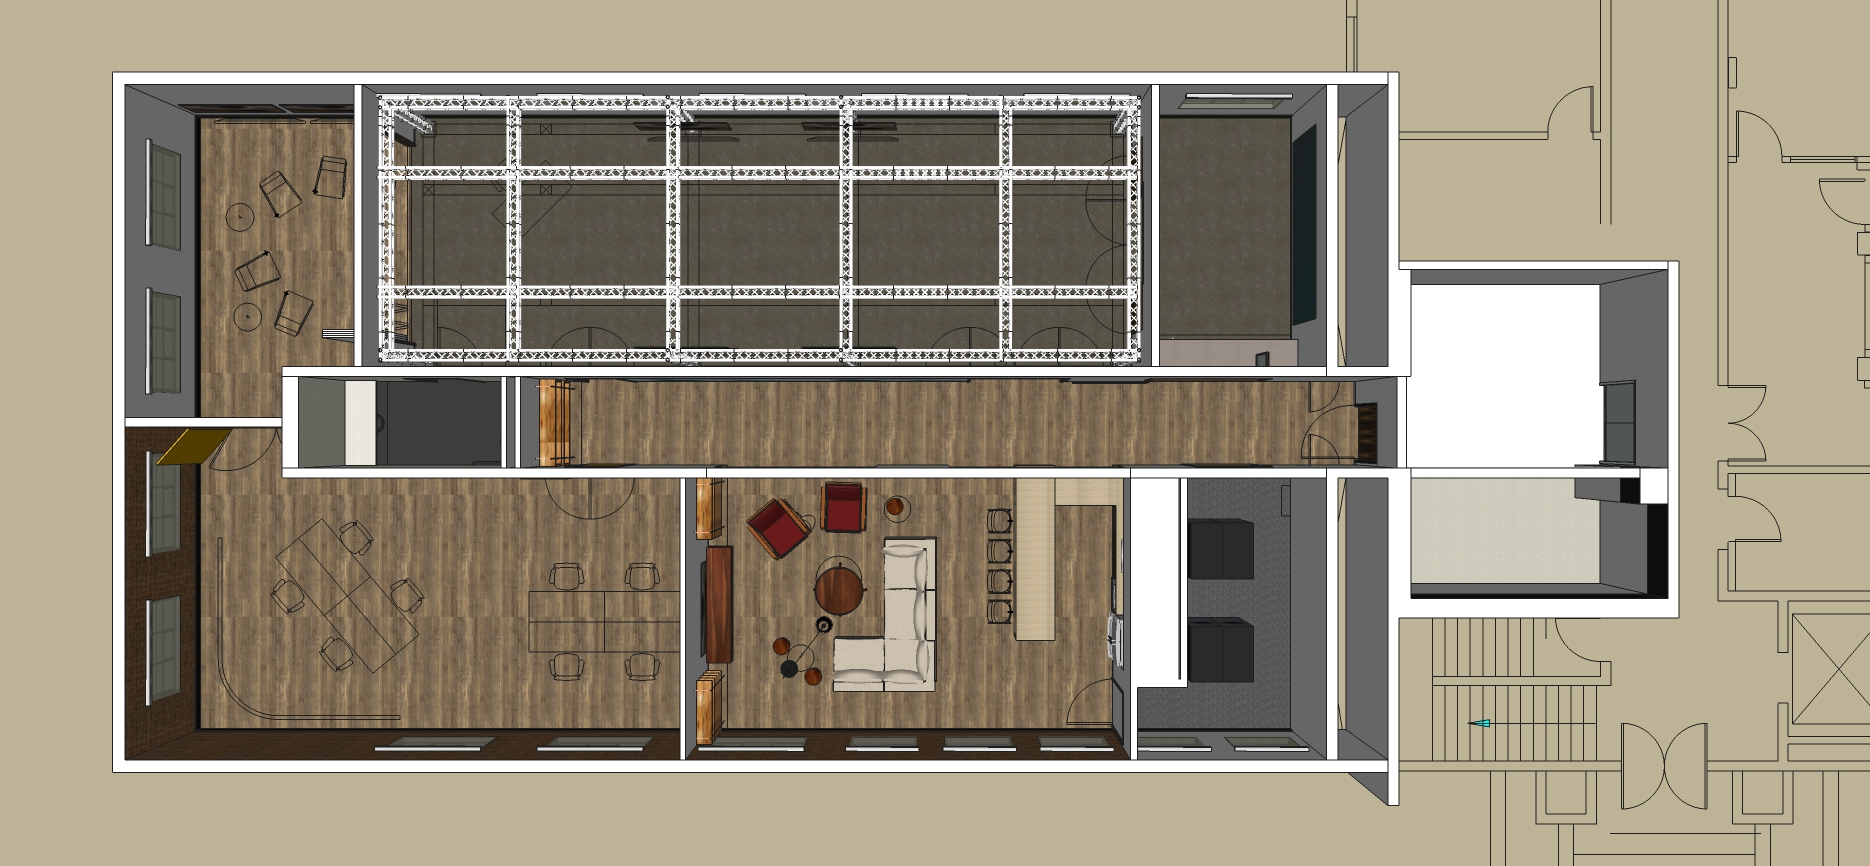 The Studio Lab floor plan